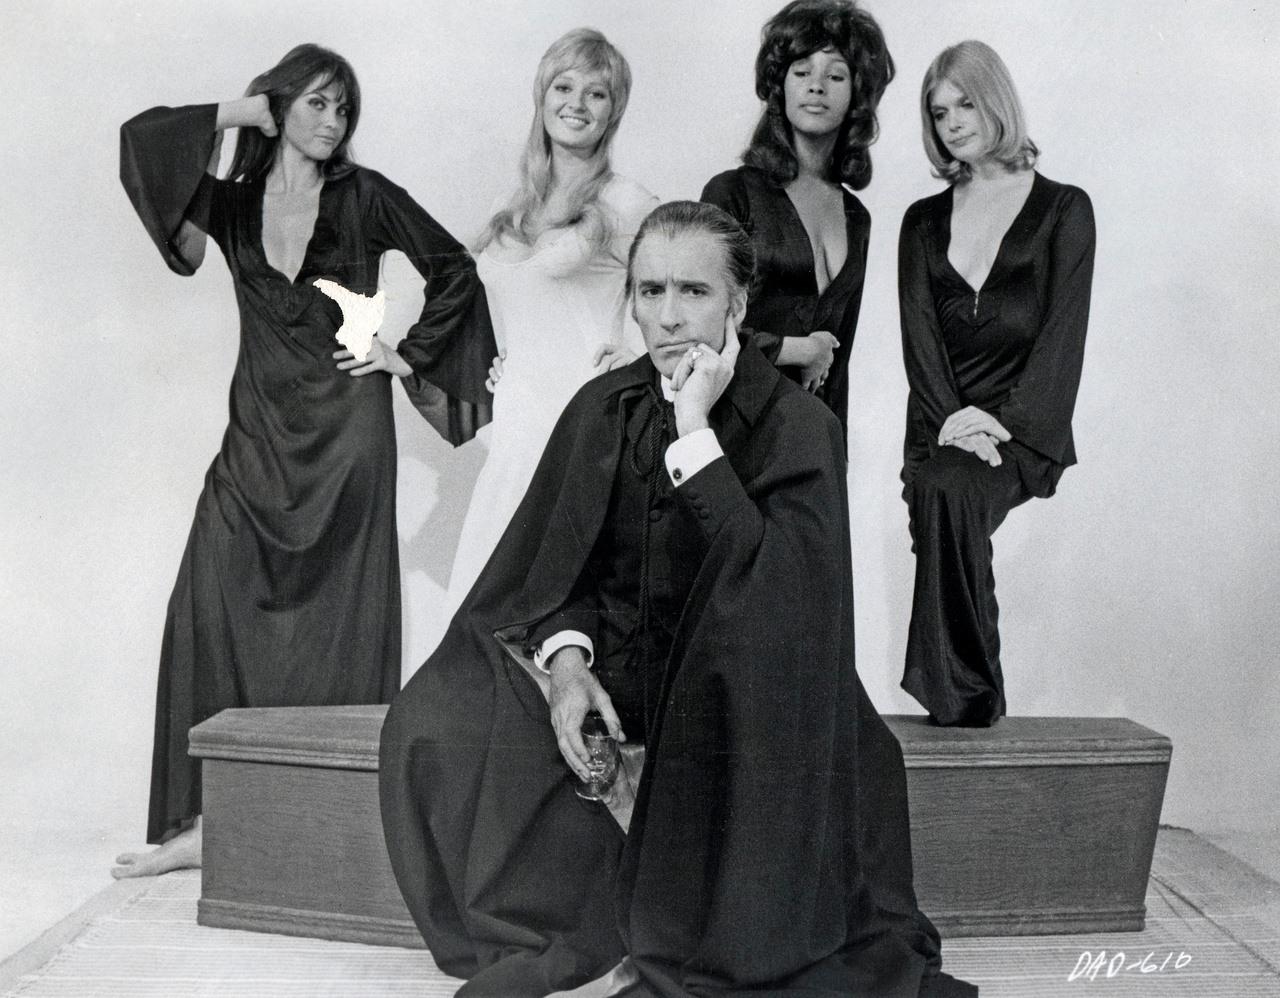 dracula ad 1972 ending a relationship